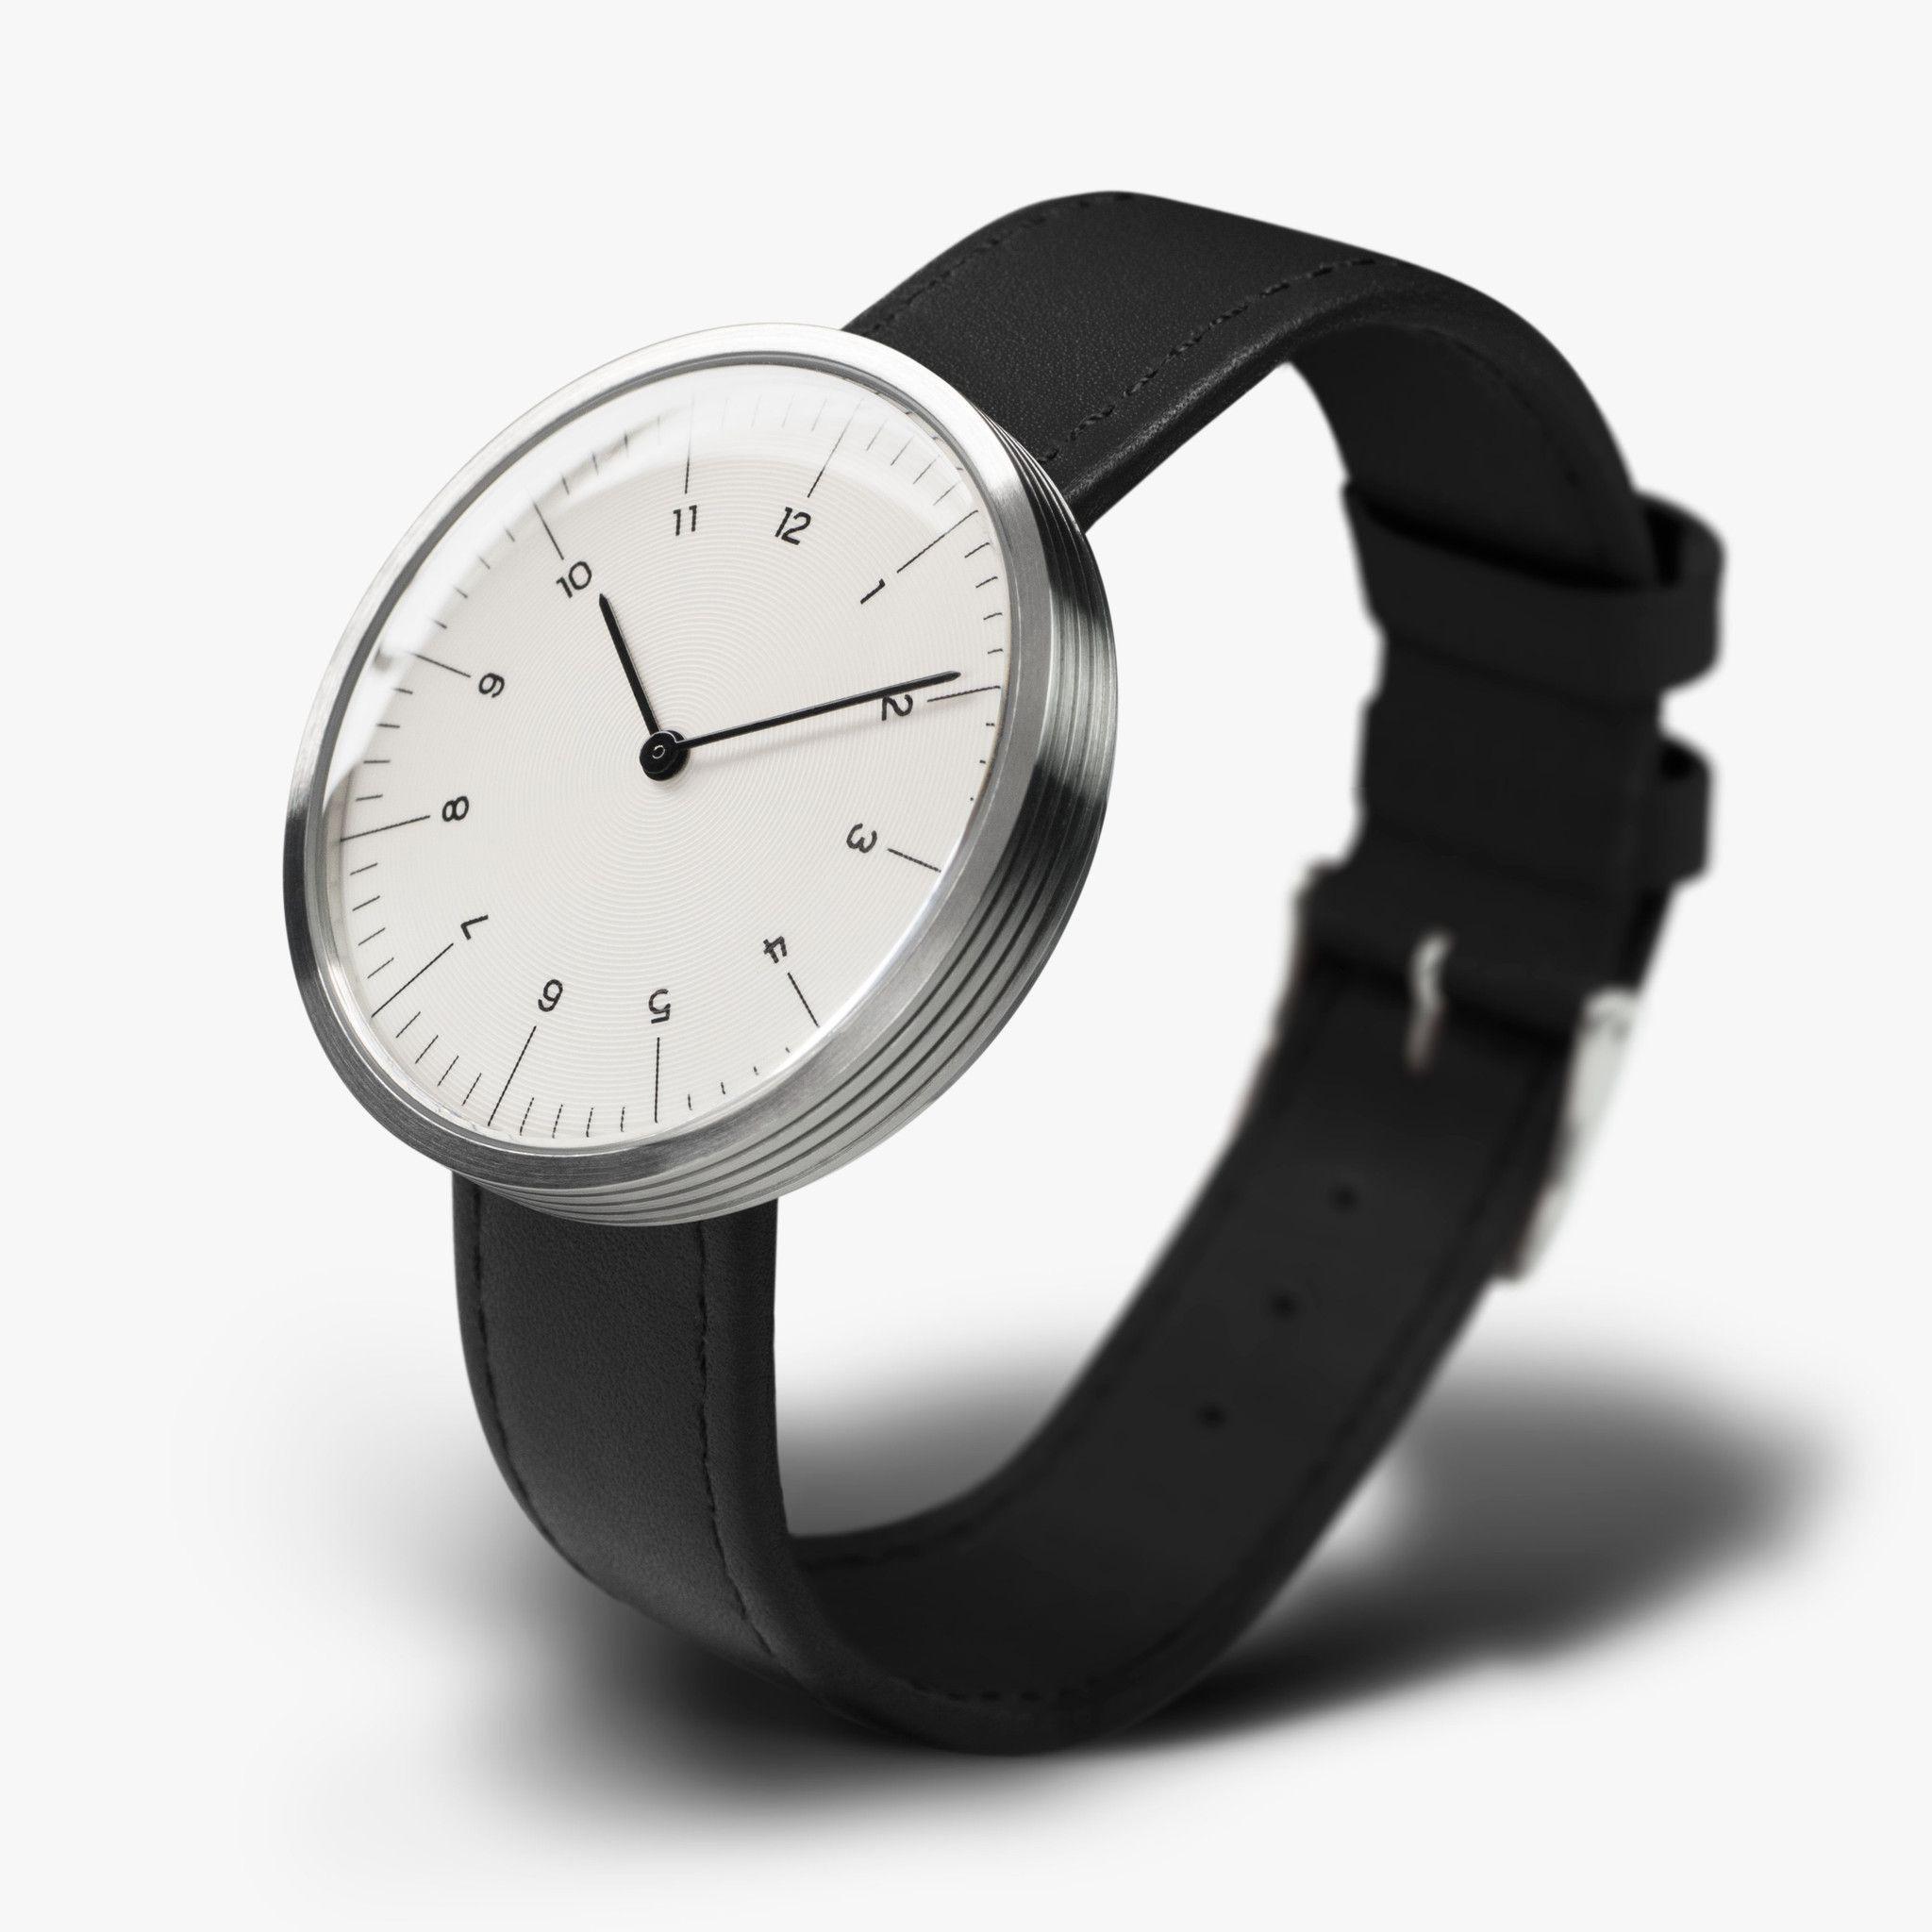 C13 Watch